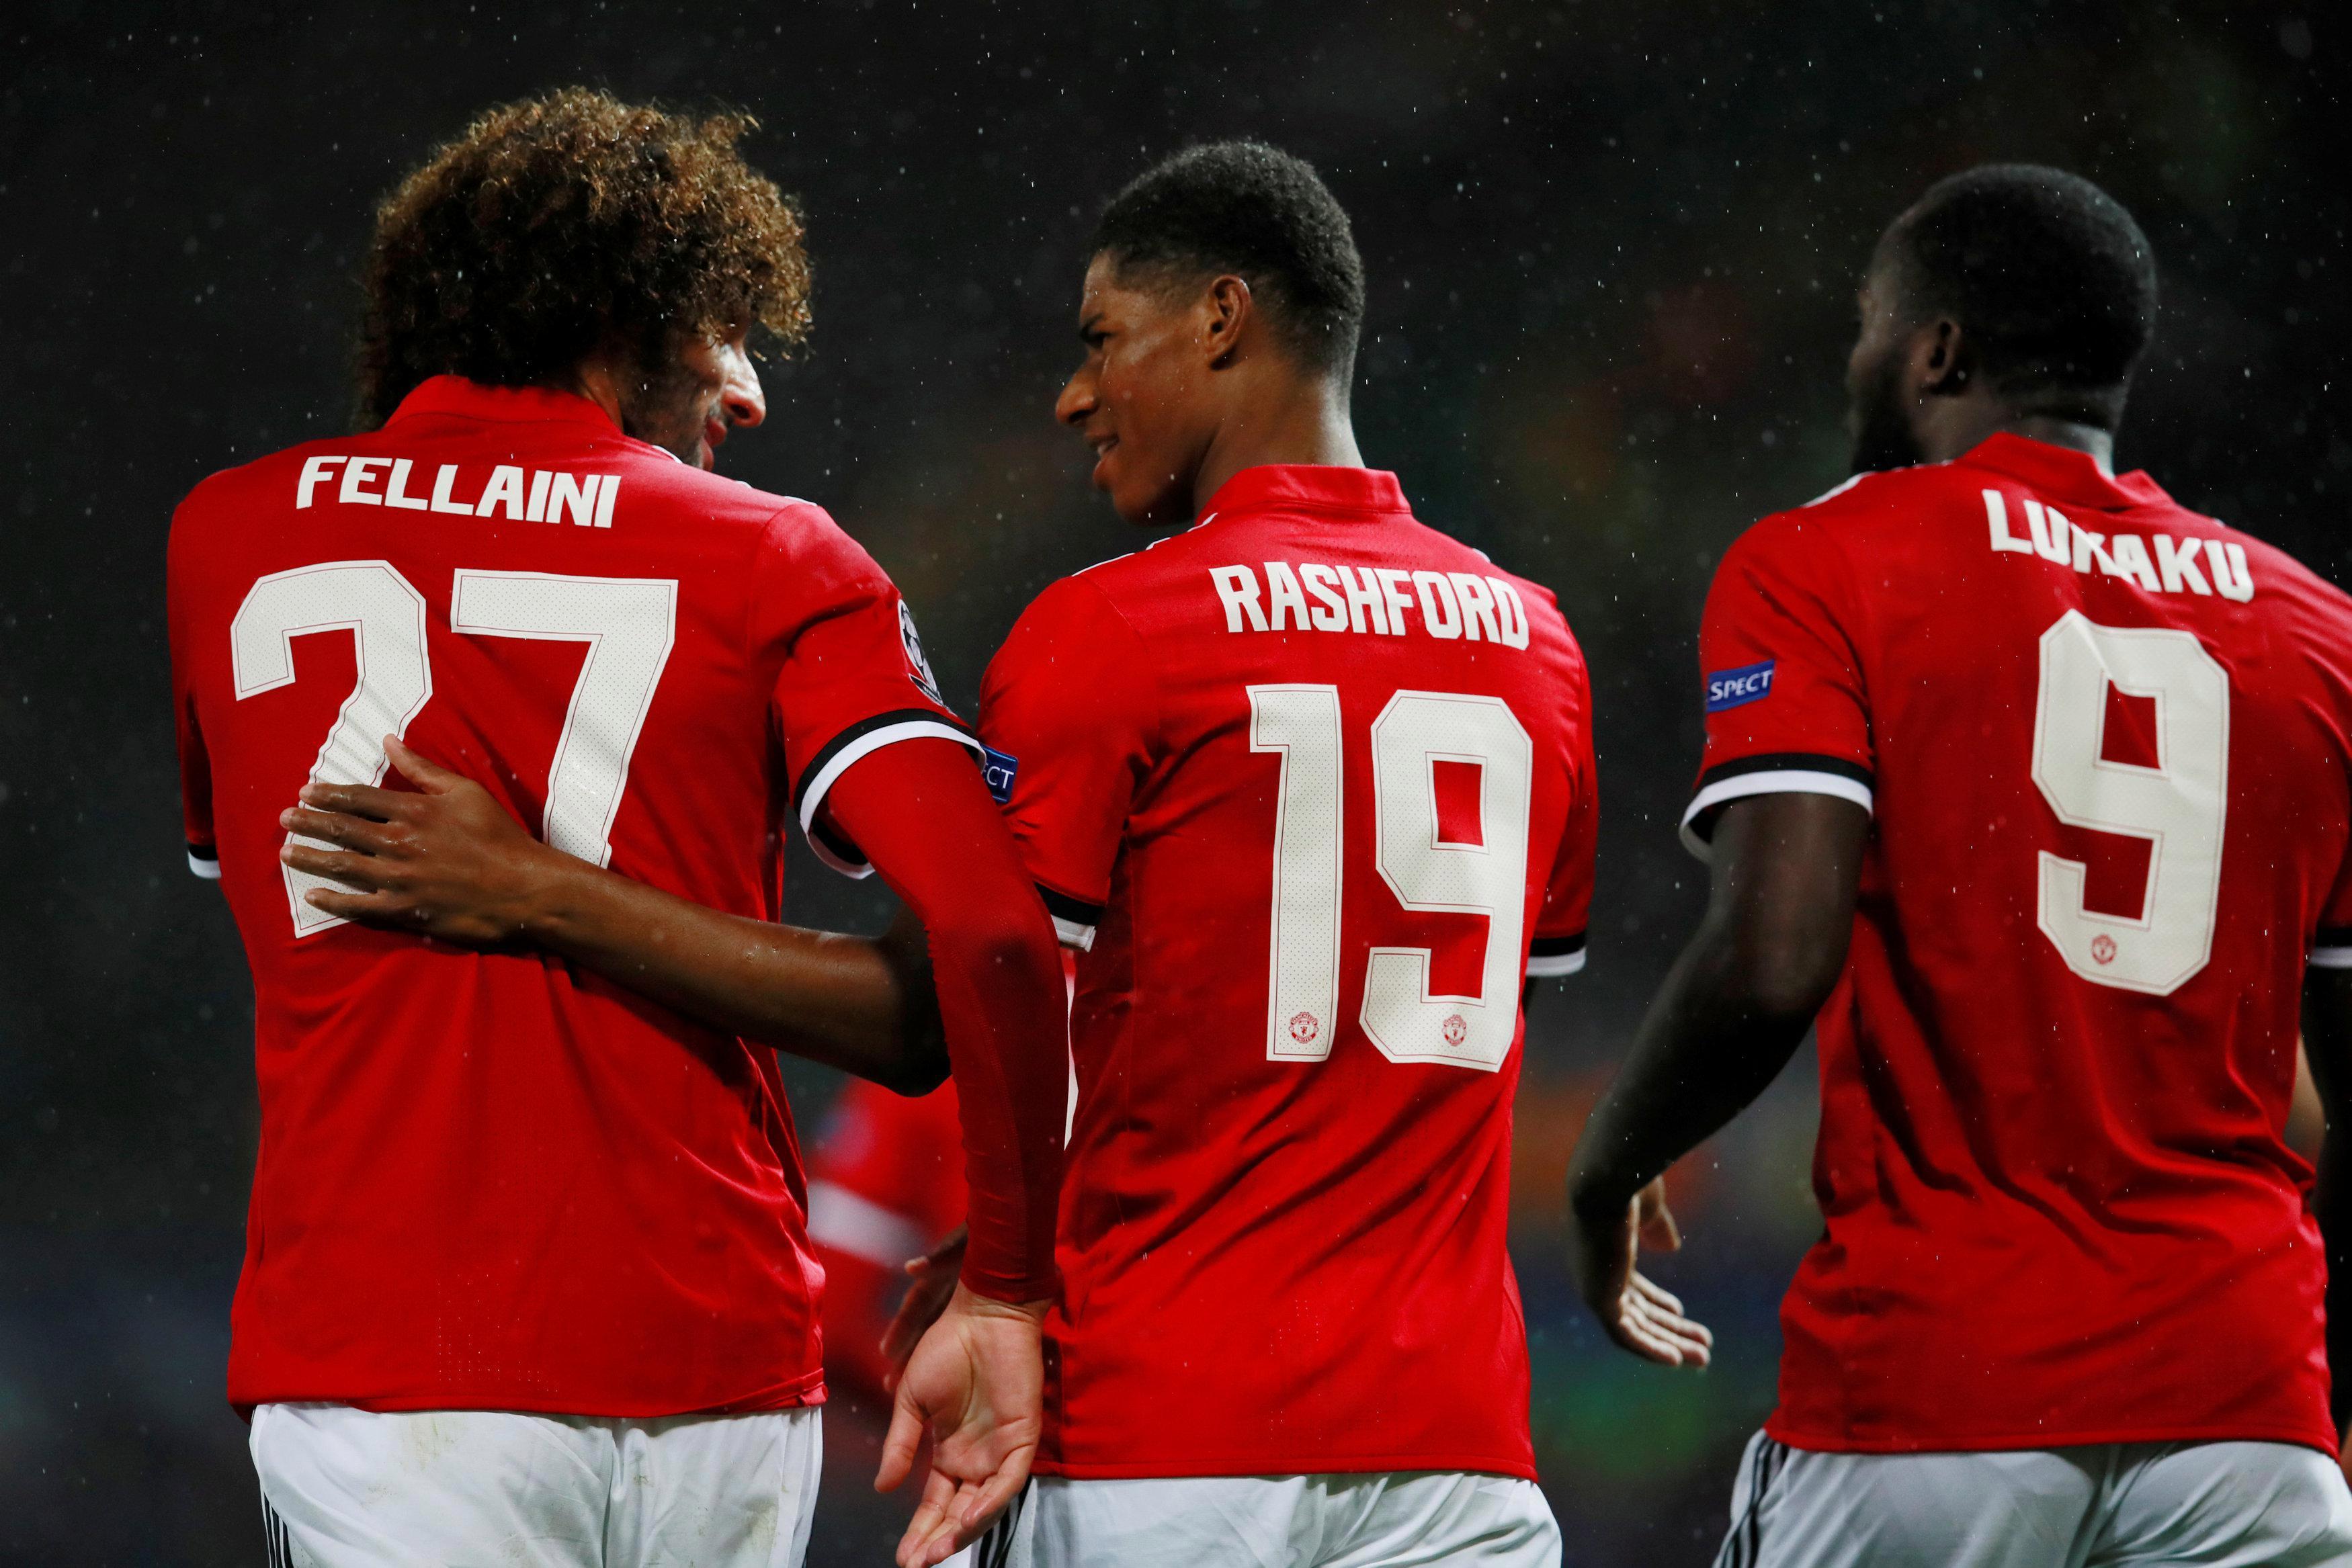 Fellaini, Rashford and Lukaku were all on target for Manchester United